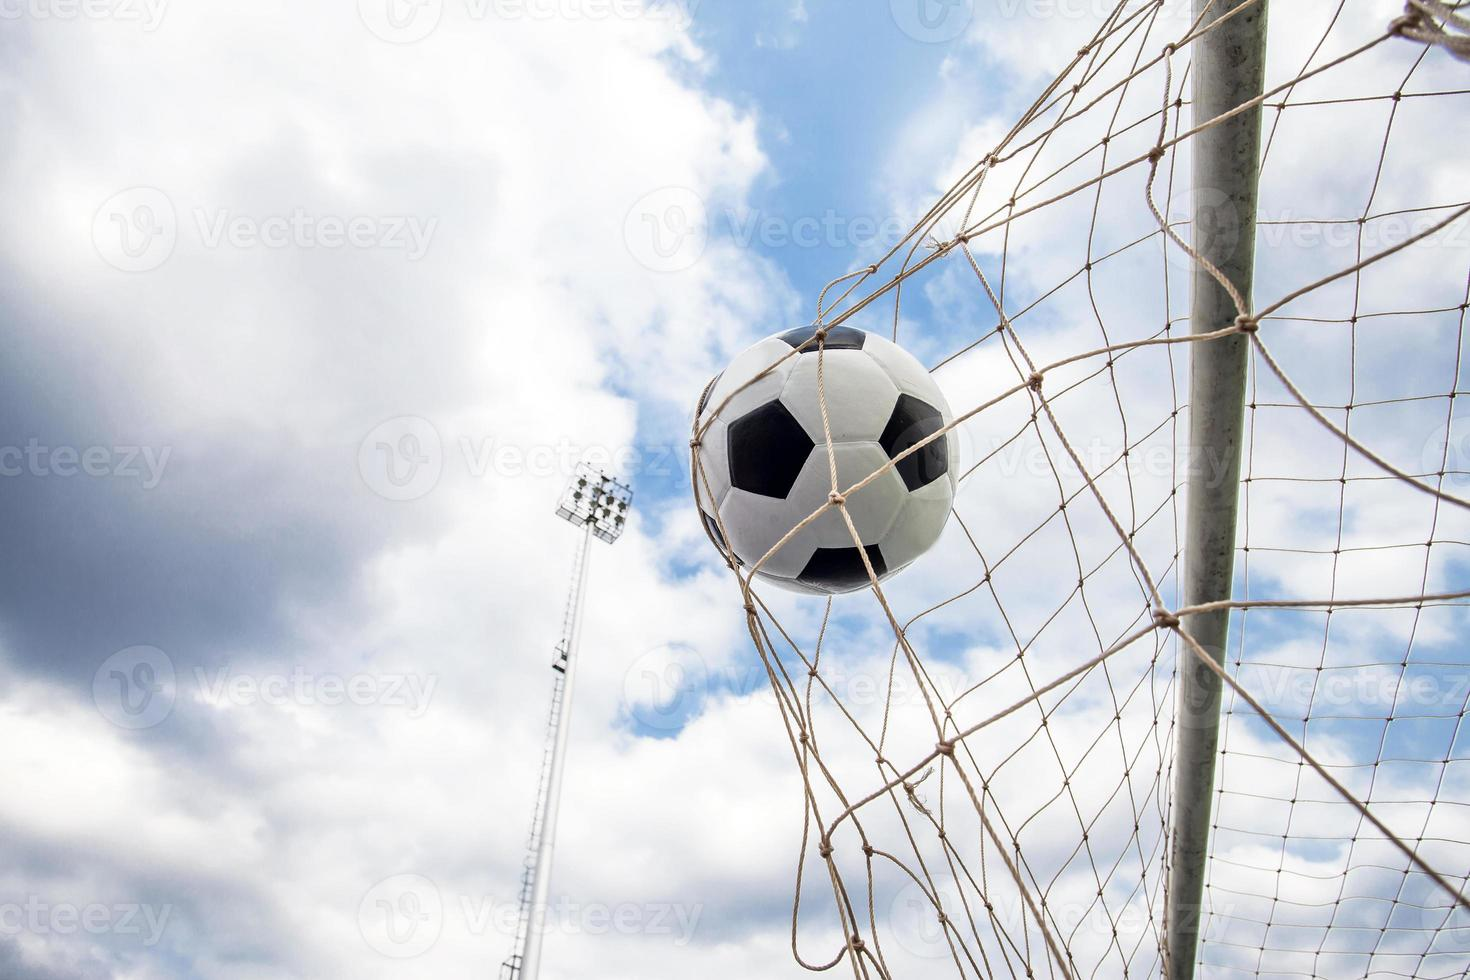 portería de fútbol soccer foto